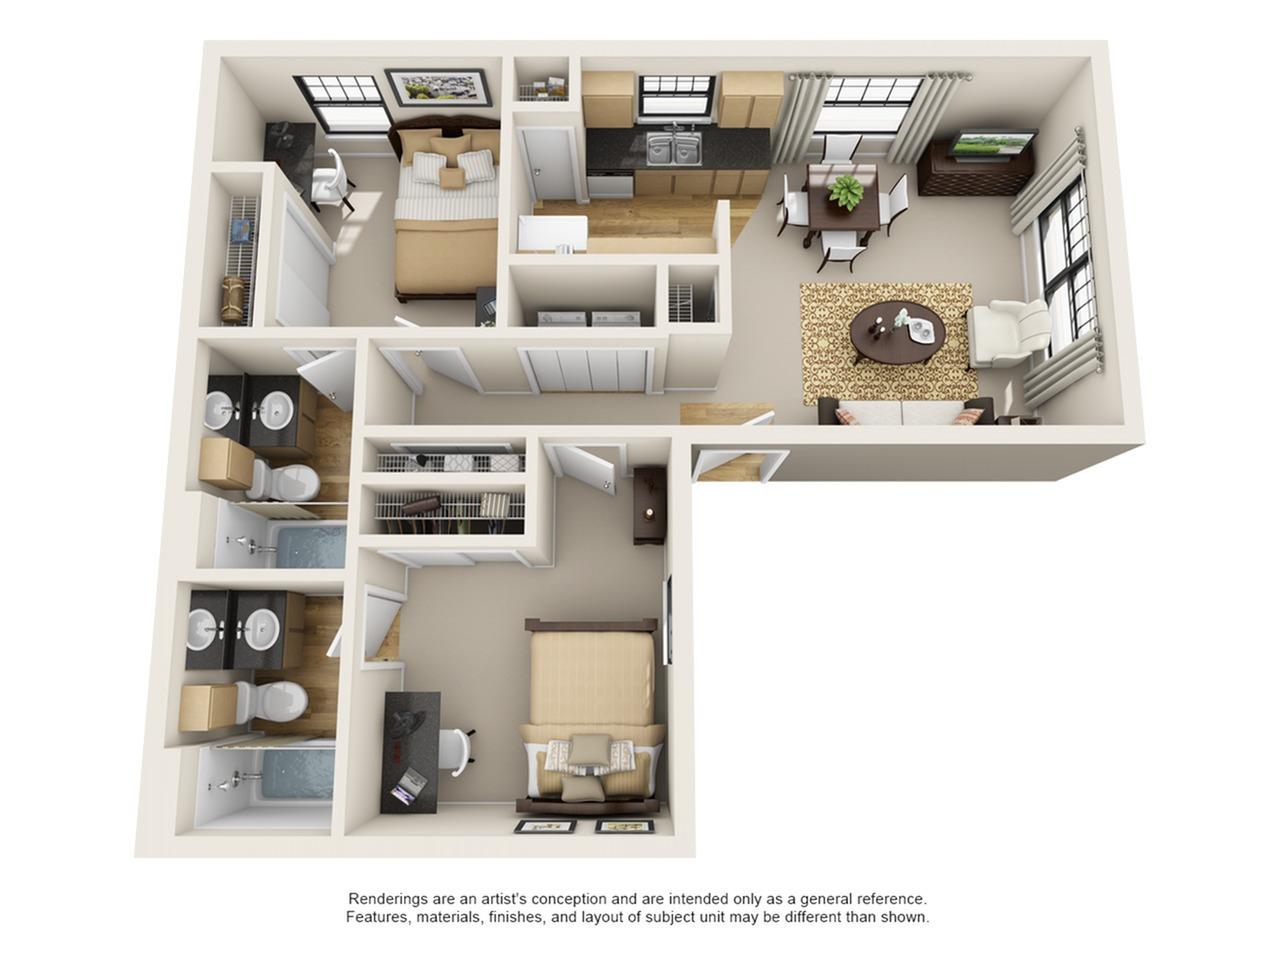 2 bedroom apartment in baton rouge